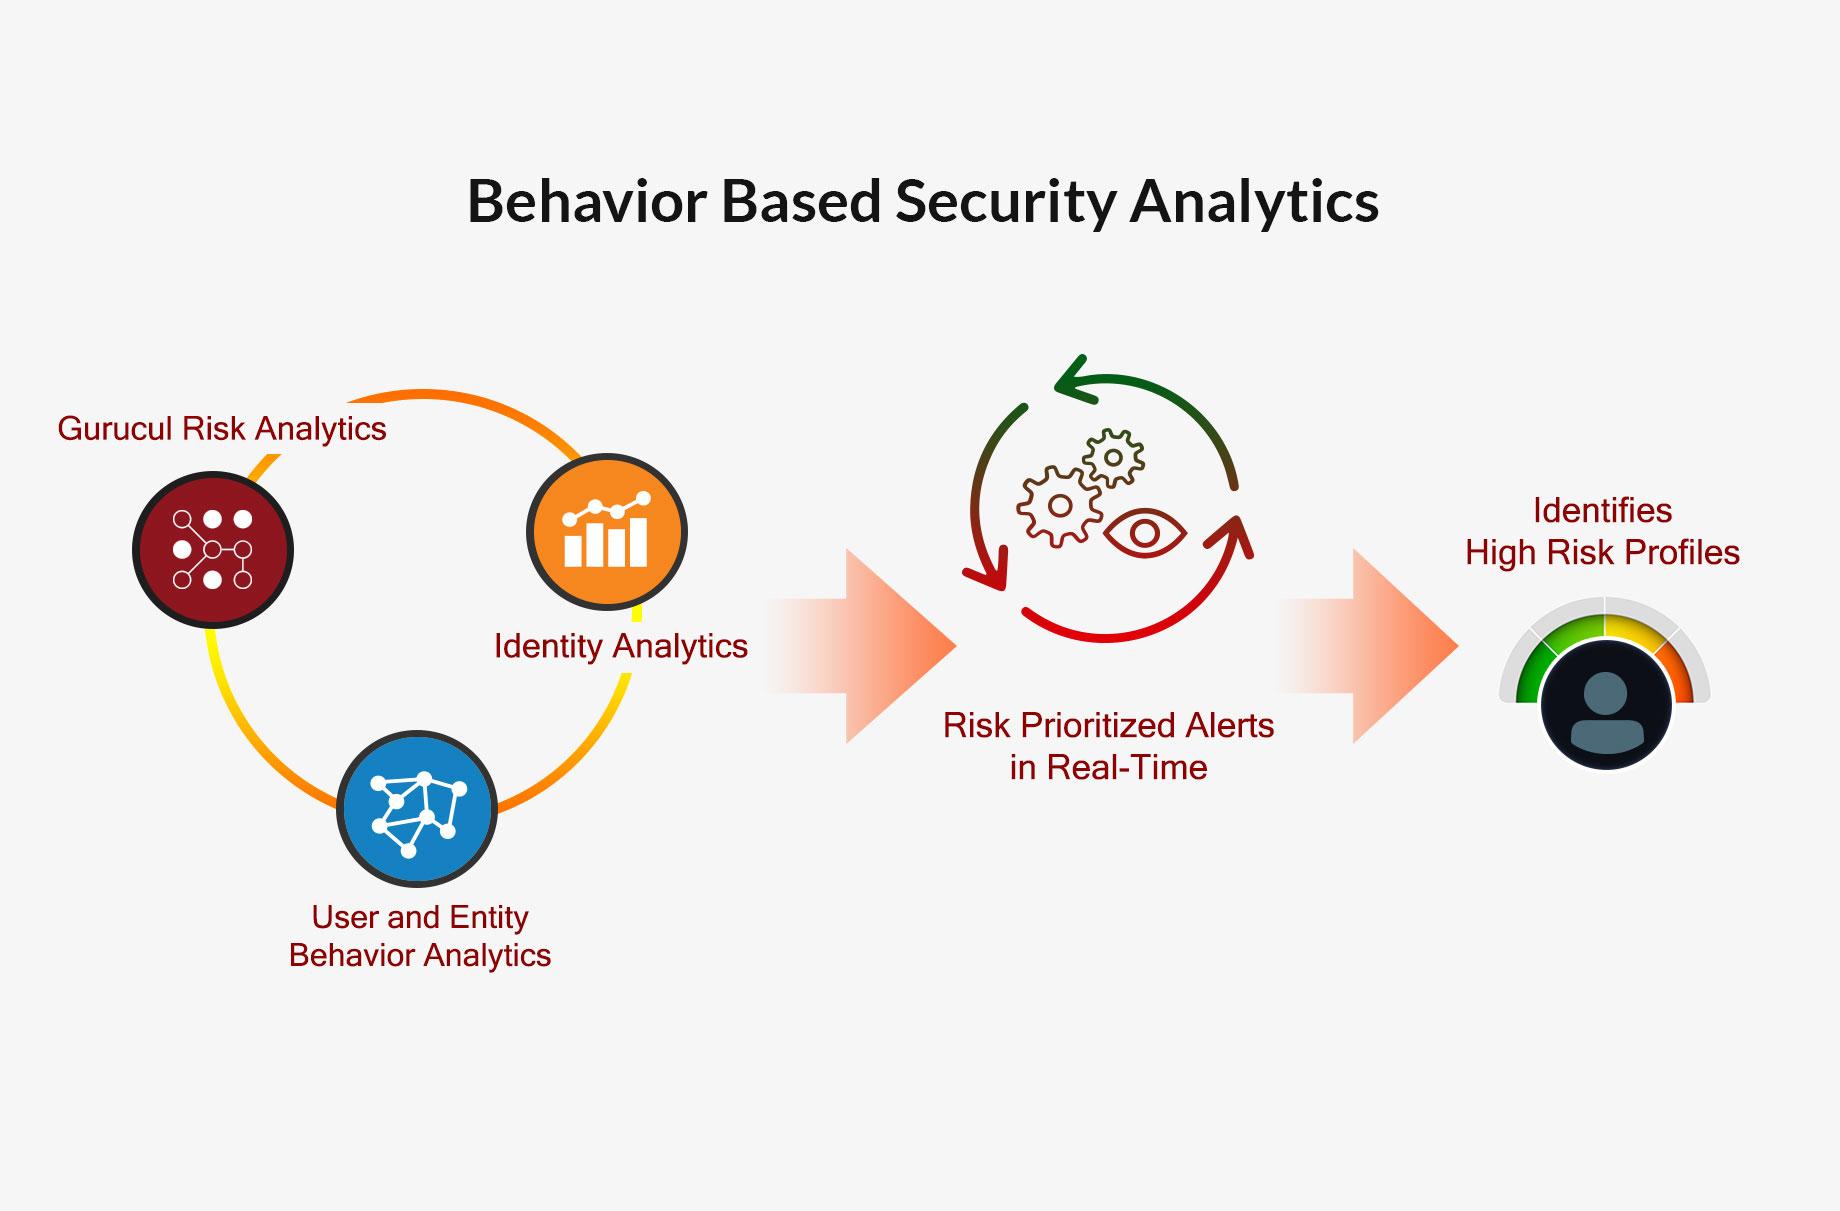 Behavior Based Security Analytics